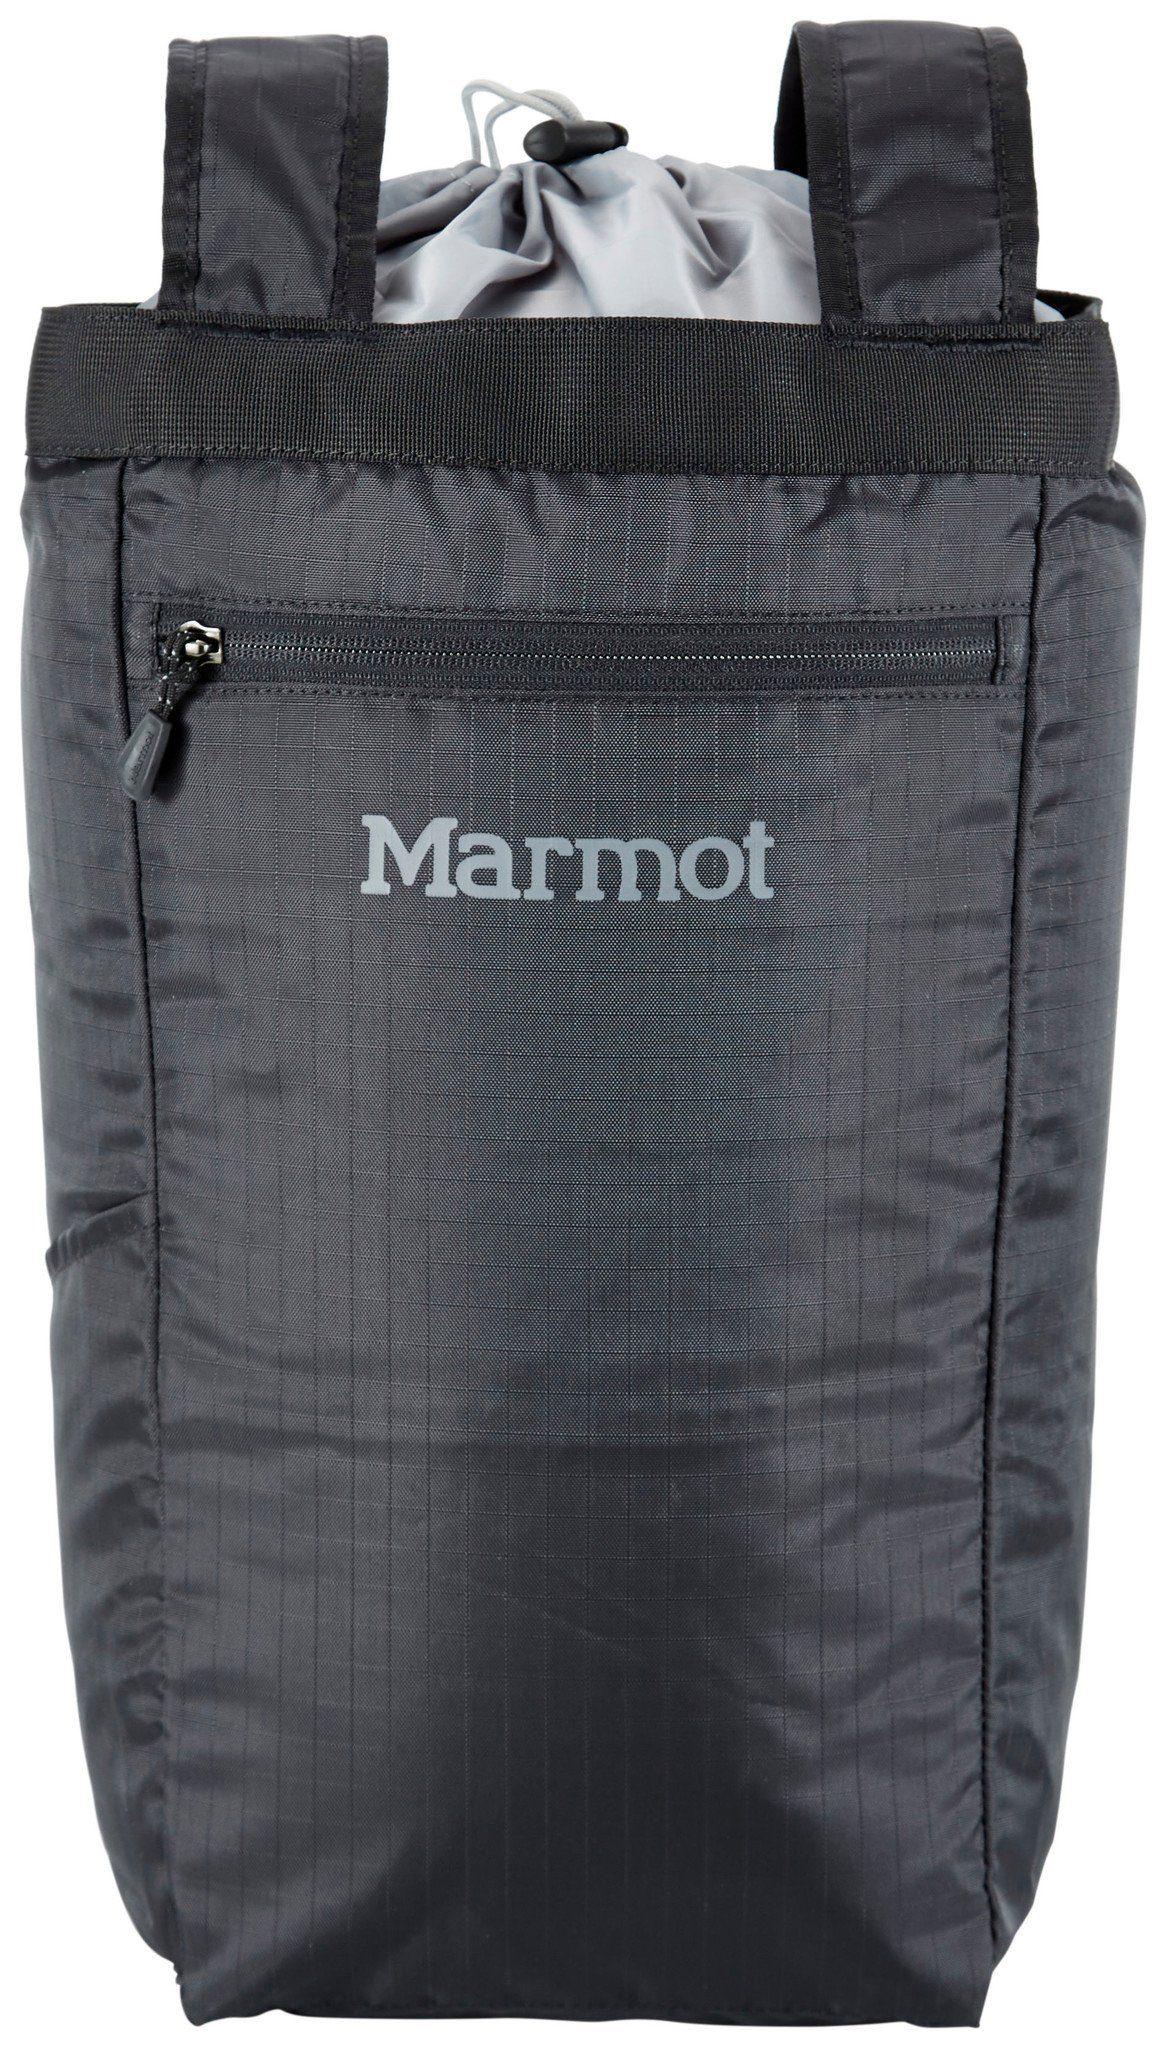 Marmot Wanderrucksack »Urban Hauler Medium«